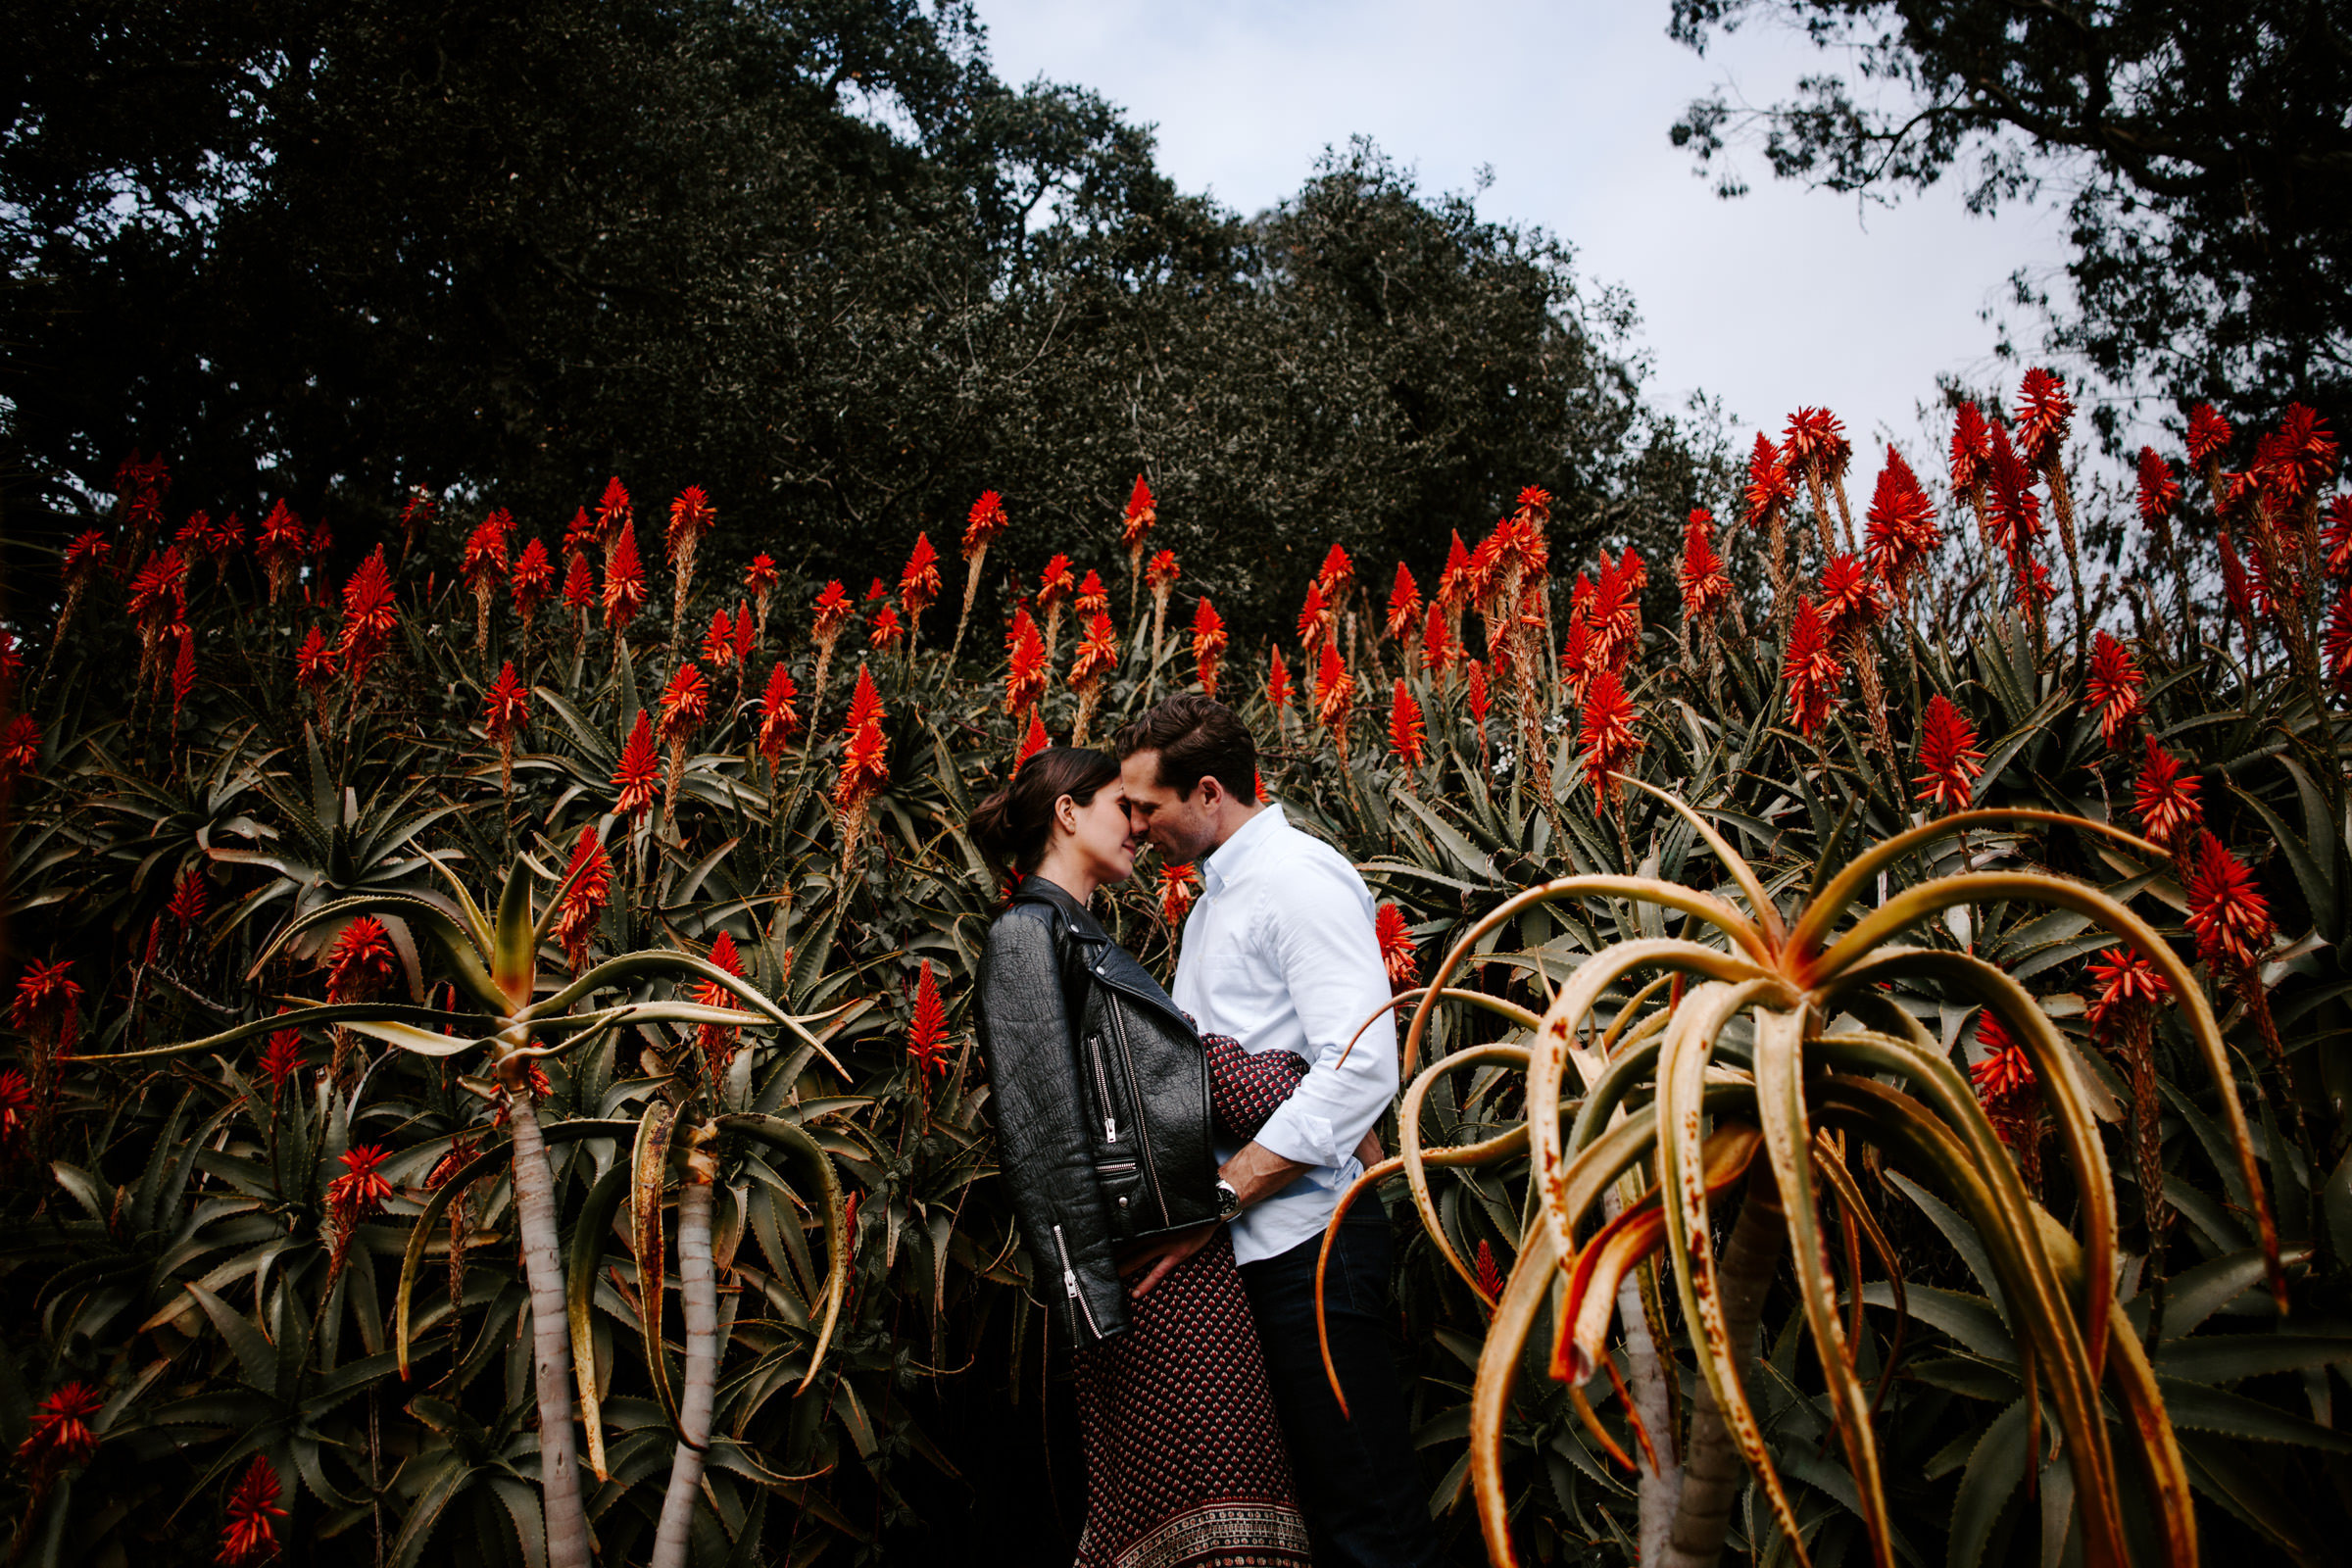 San-Francisco-Photographer-Pierce-Weddings-87.jpg